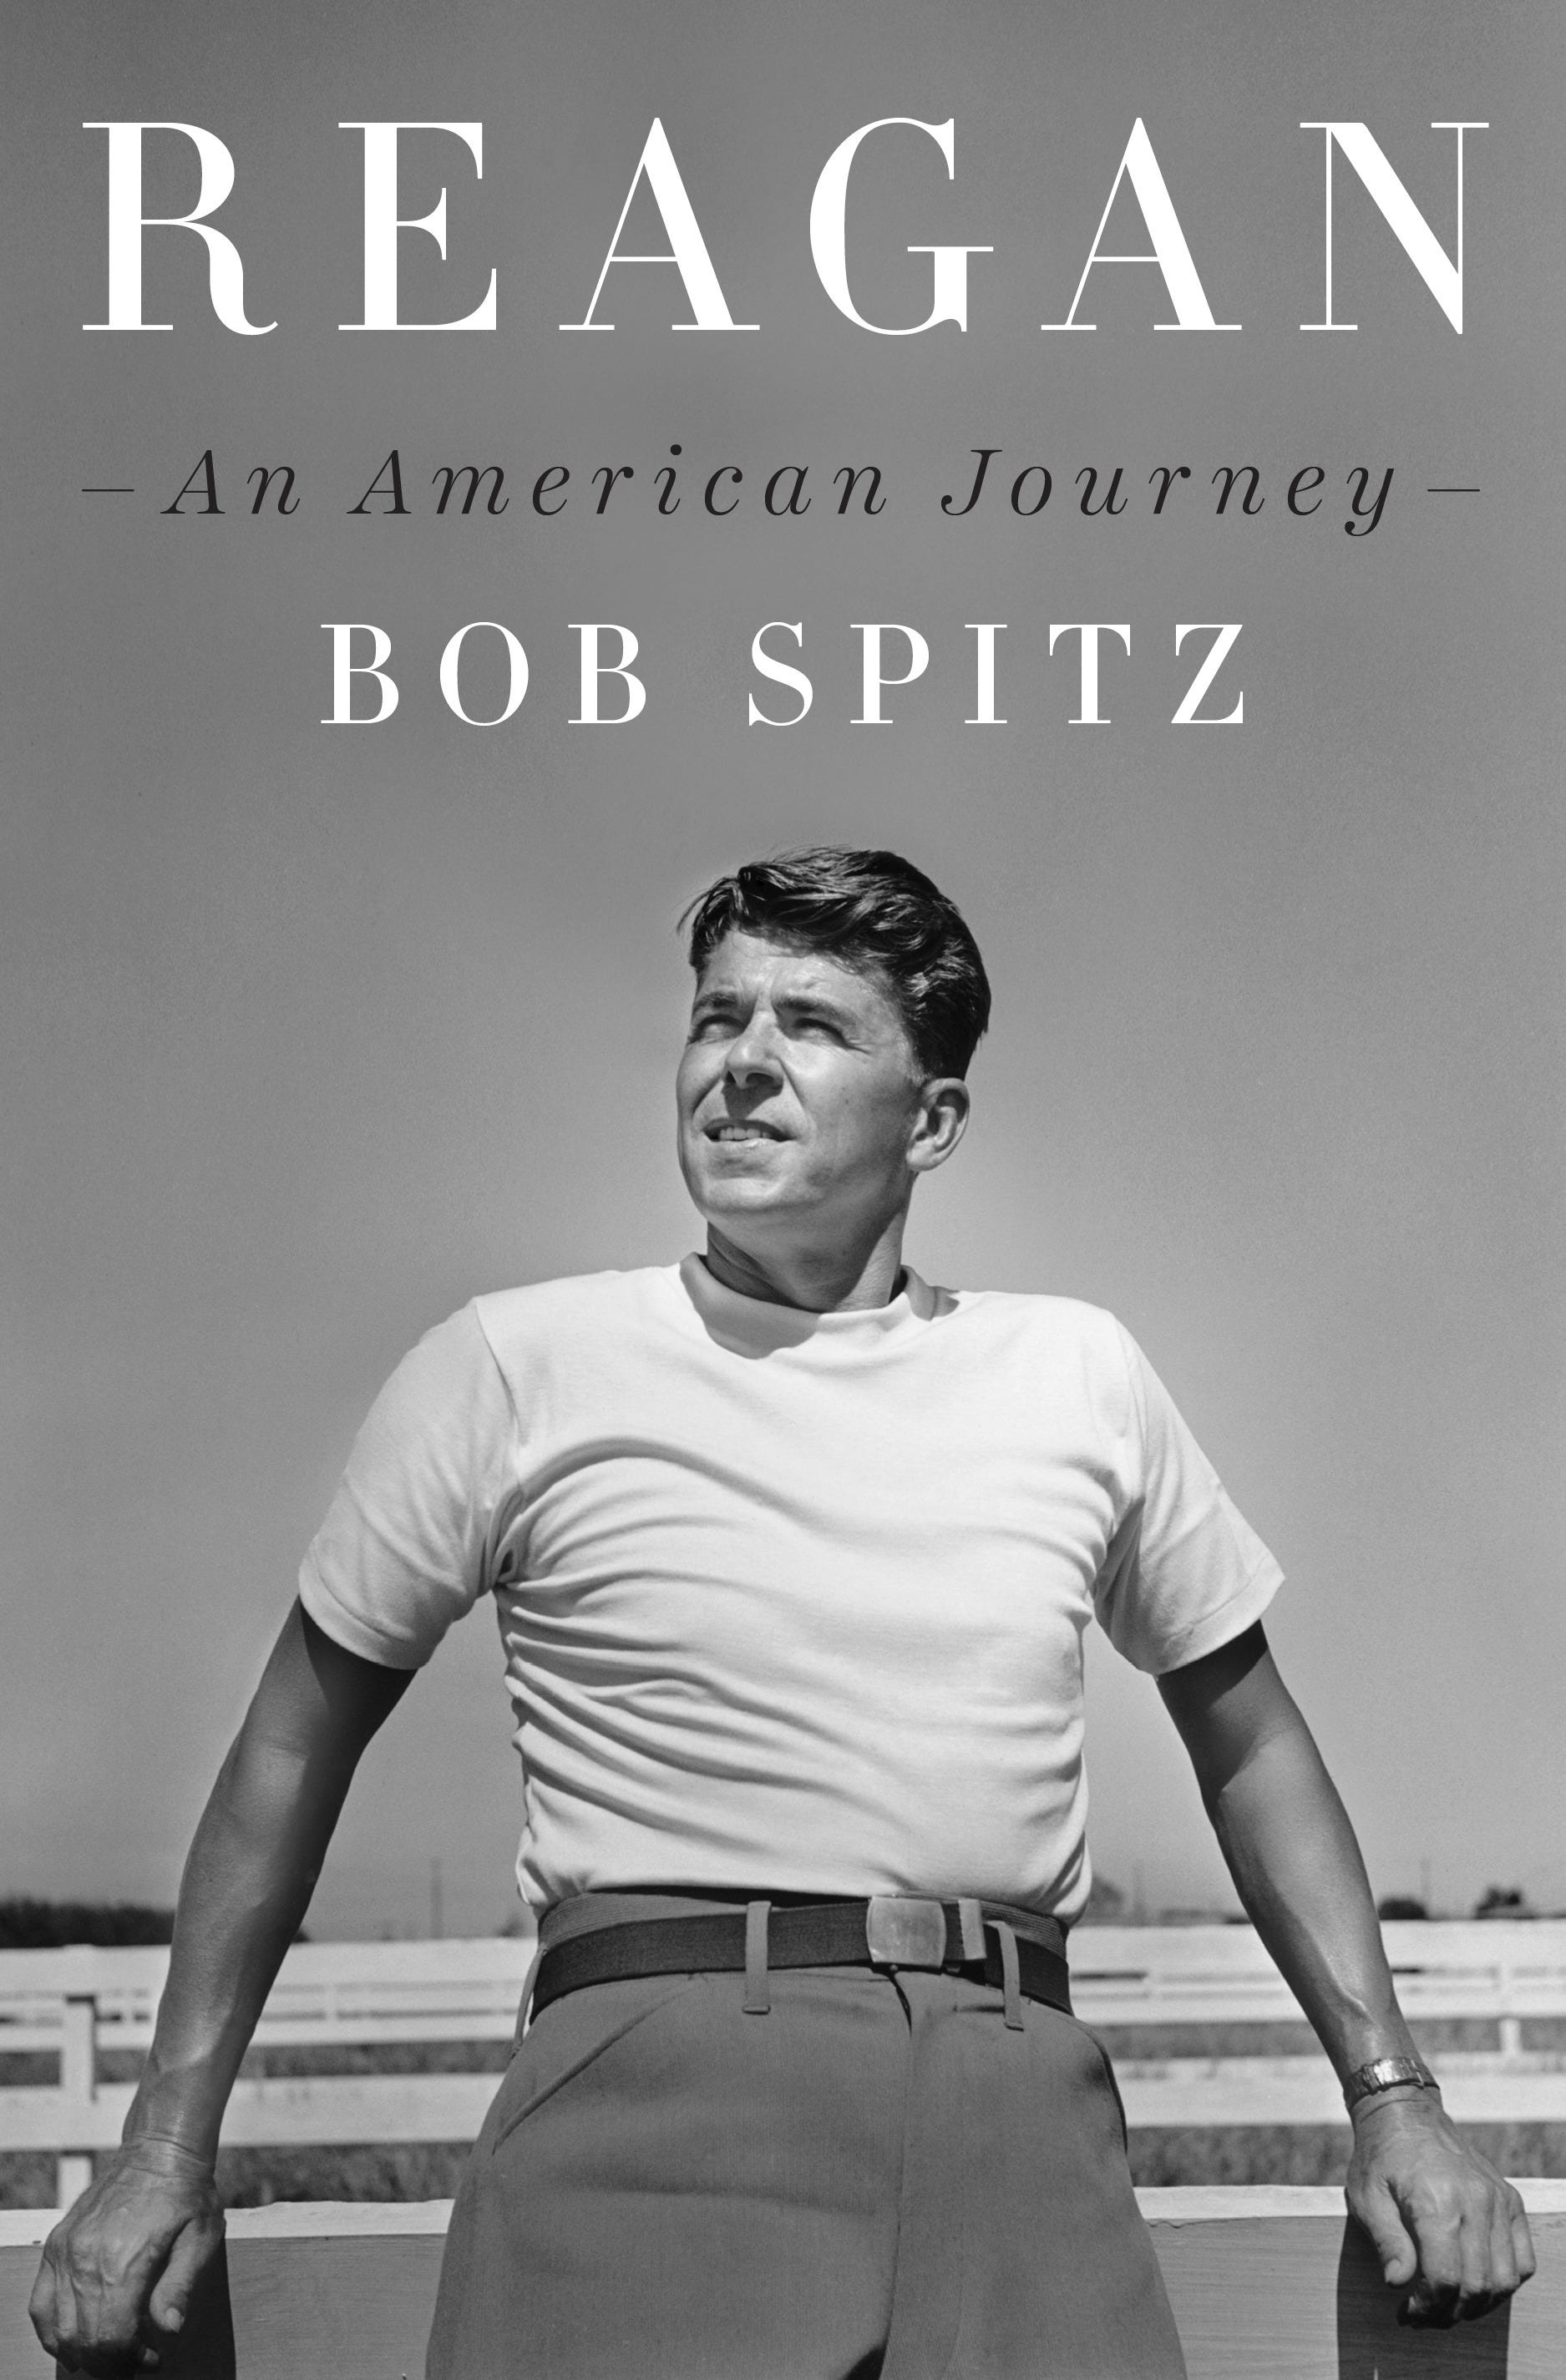 An American Journey - Bob Spitz